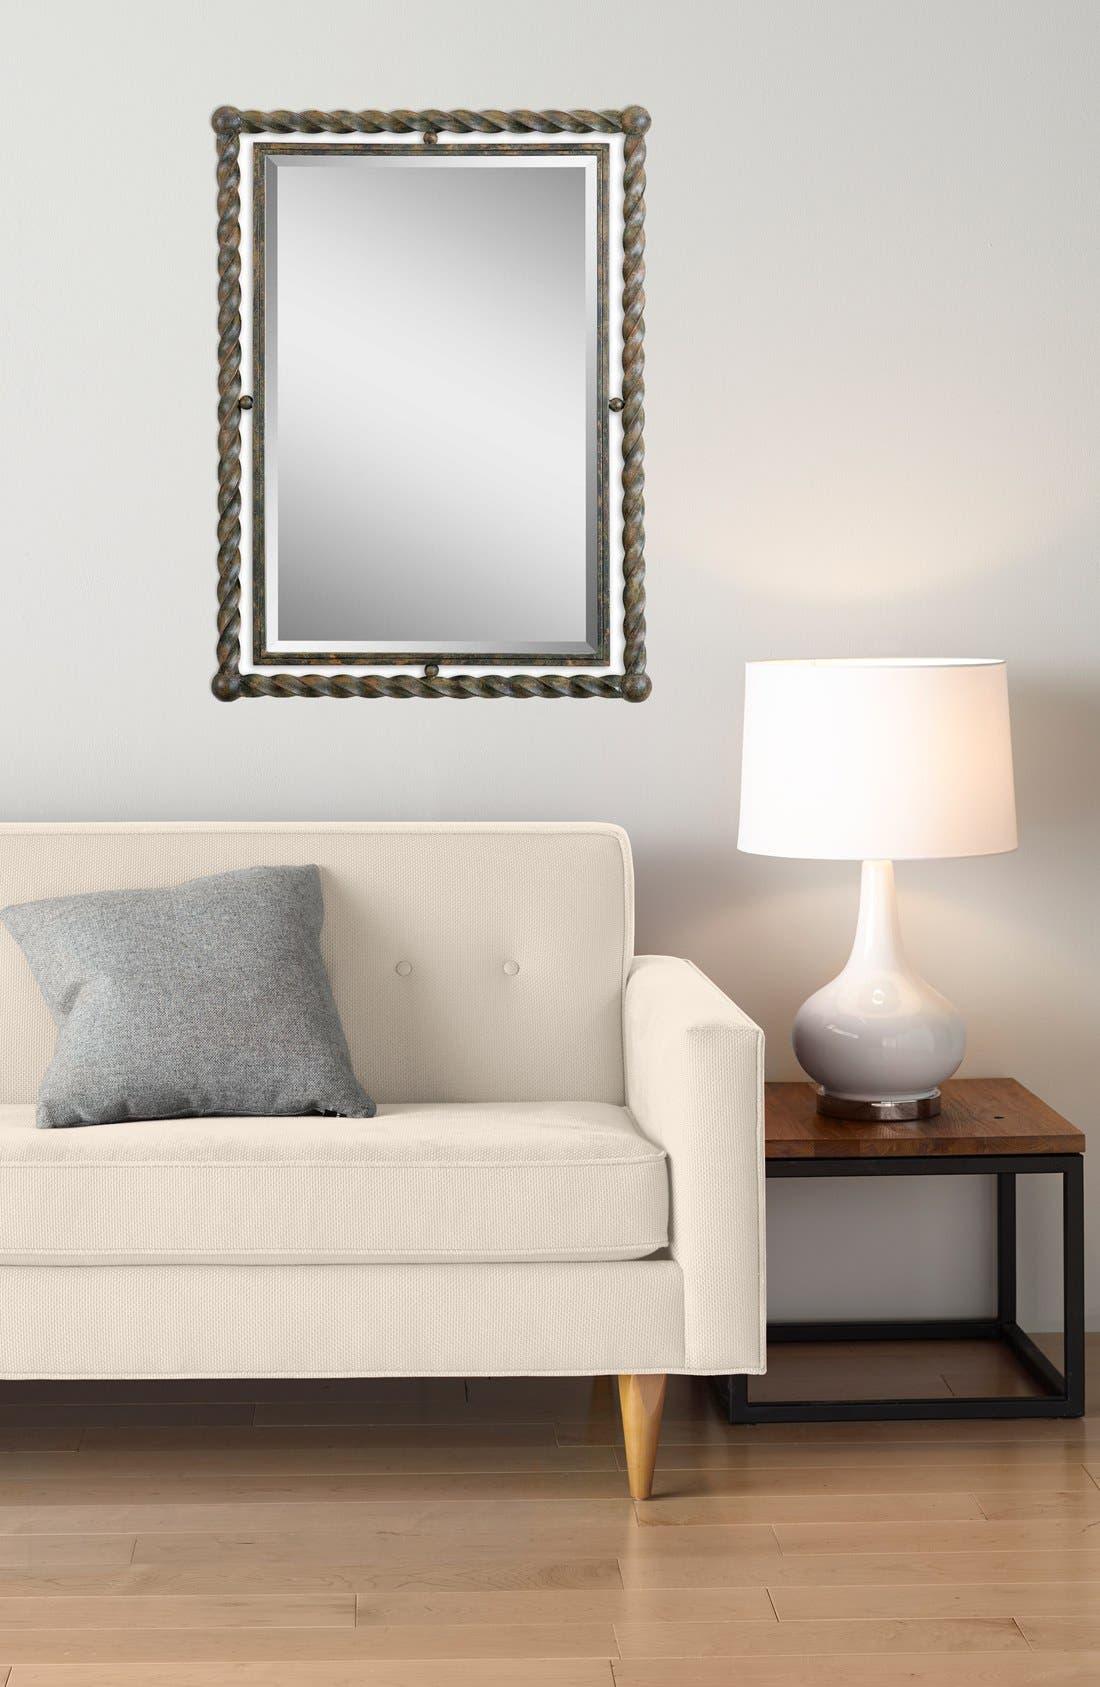 'Garrick' Wrought Iron Mirror,                             Alternate thumbnail 4, color,                             200